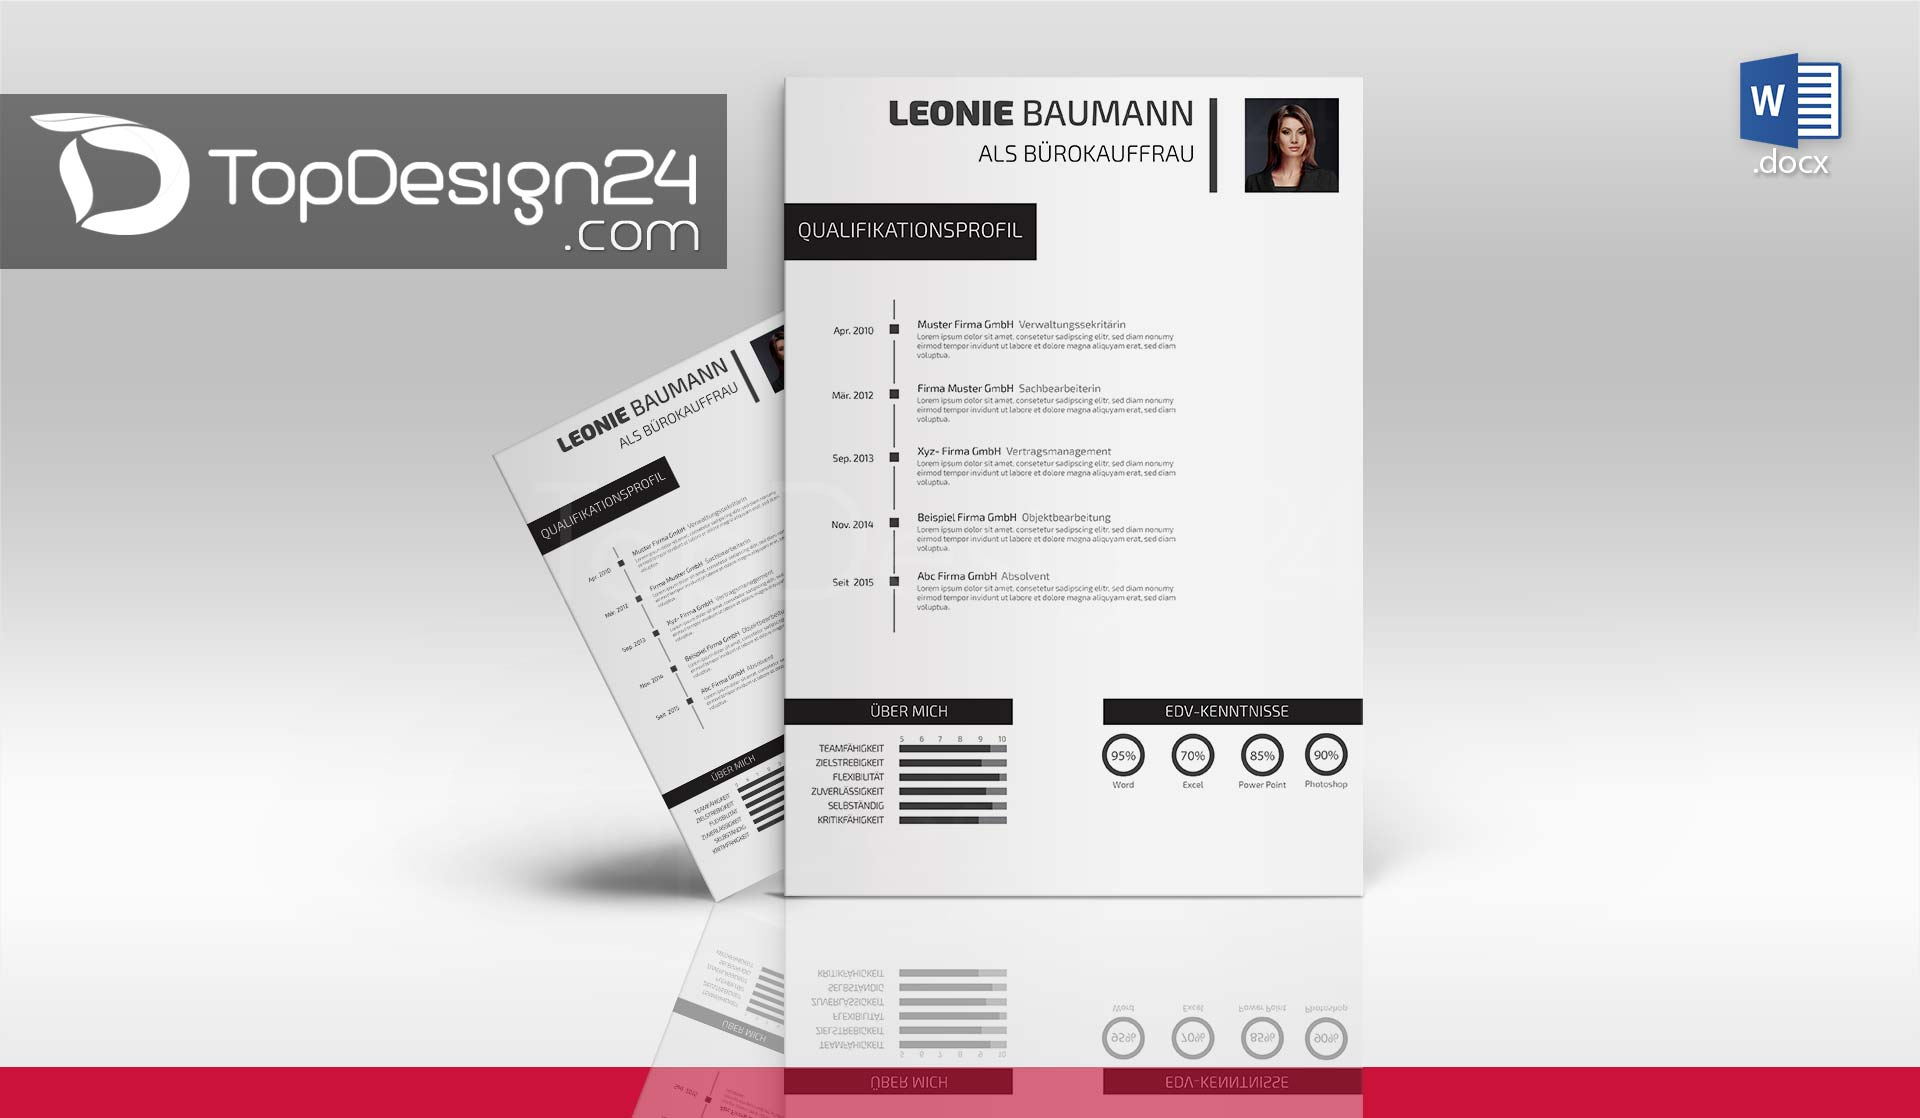 bewerbung design word dowload - Qualifikationsprofil Muster